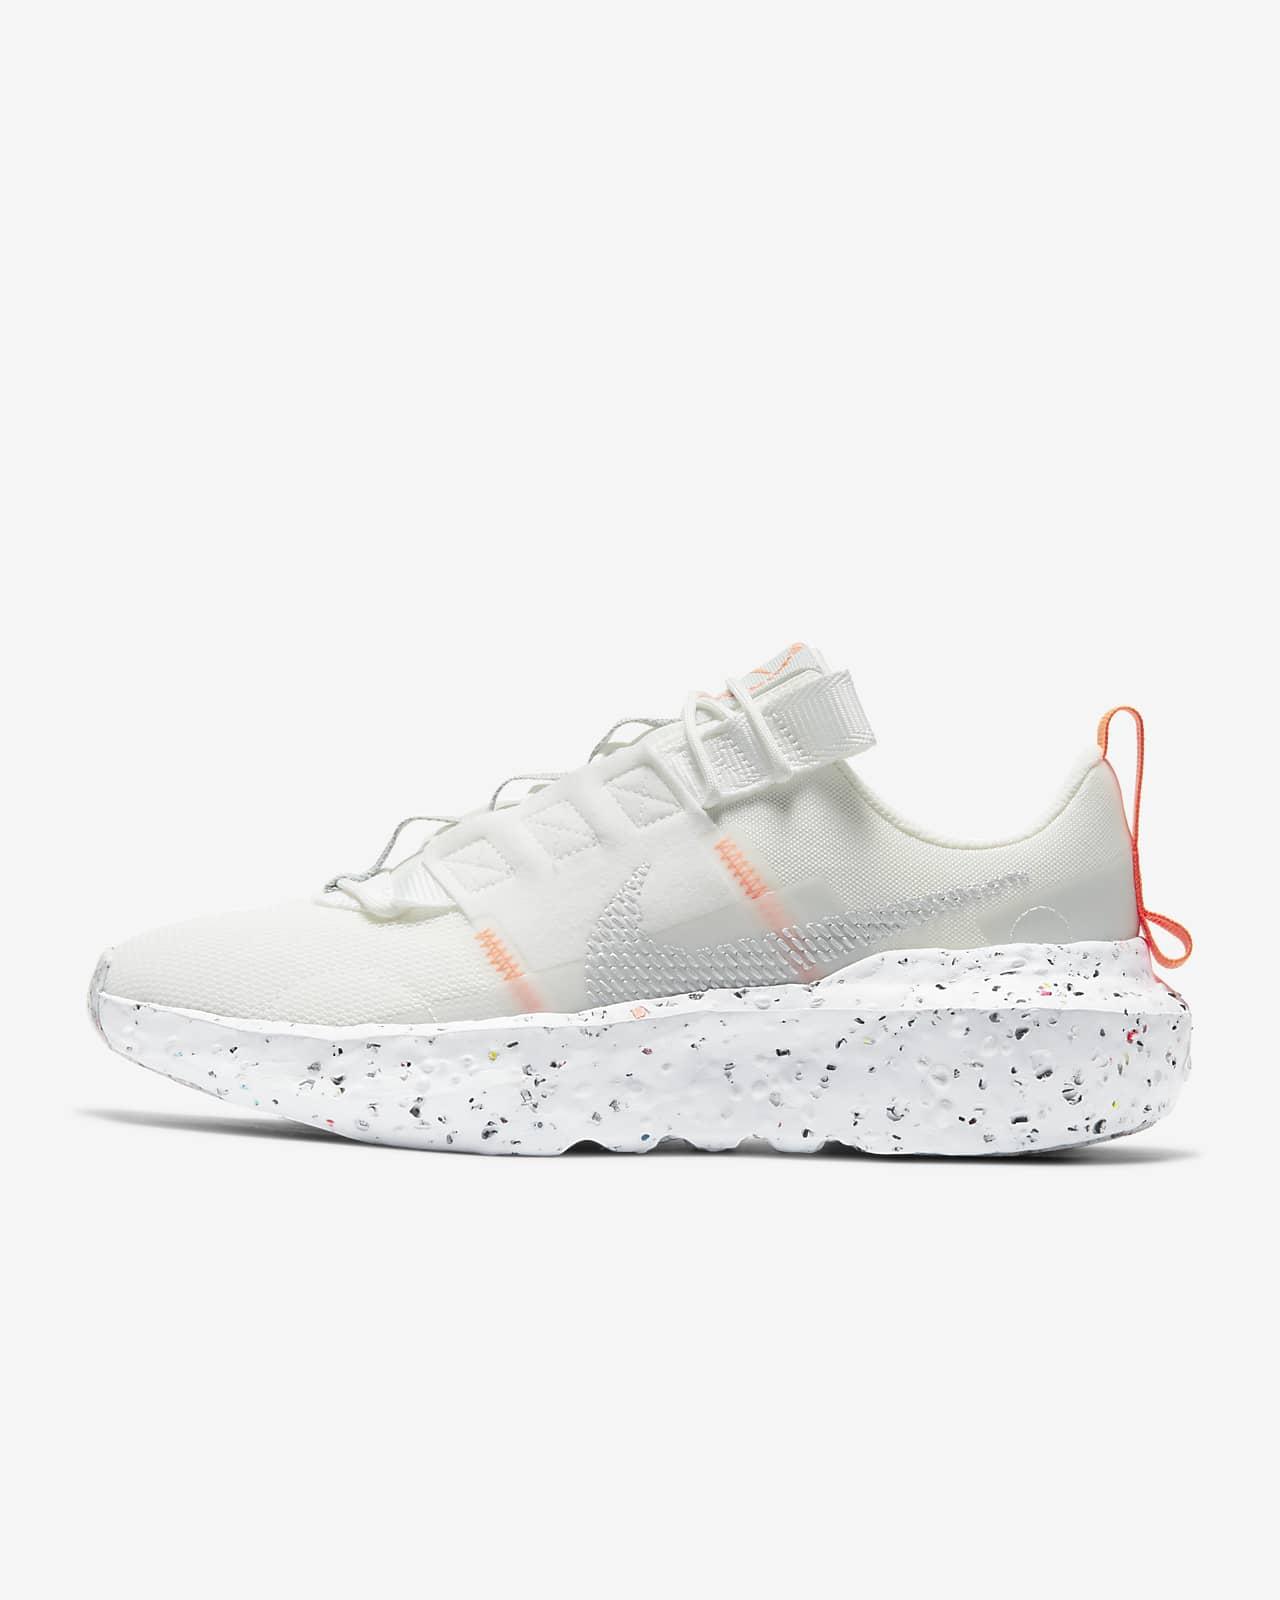 Nike Crater Impact Women's Shoes